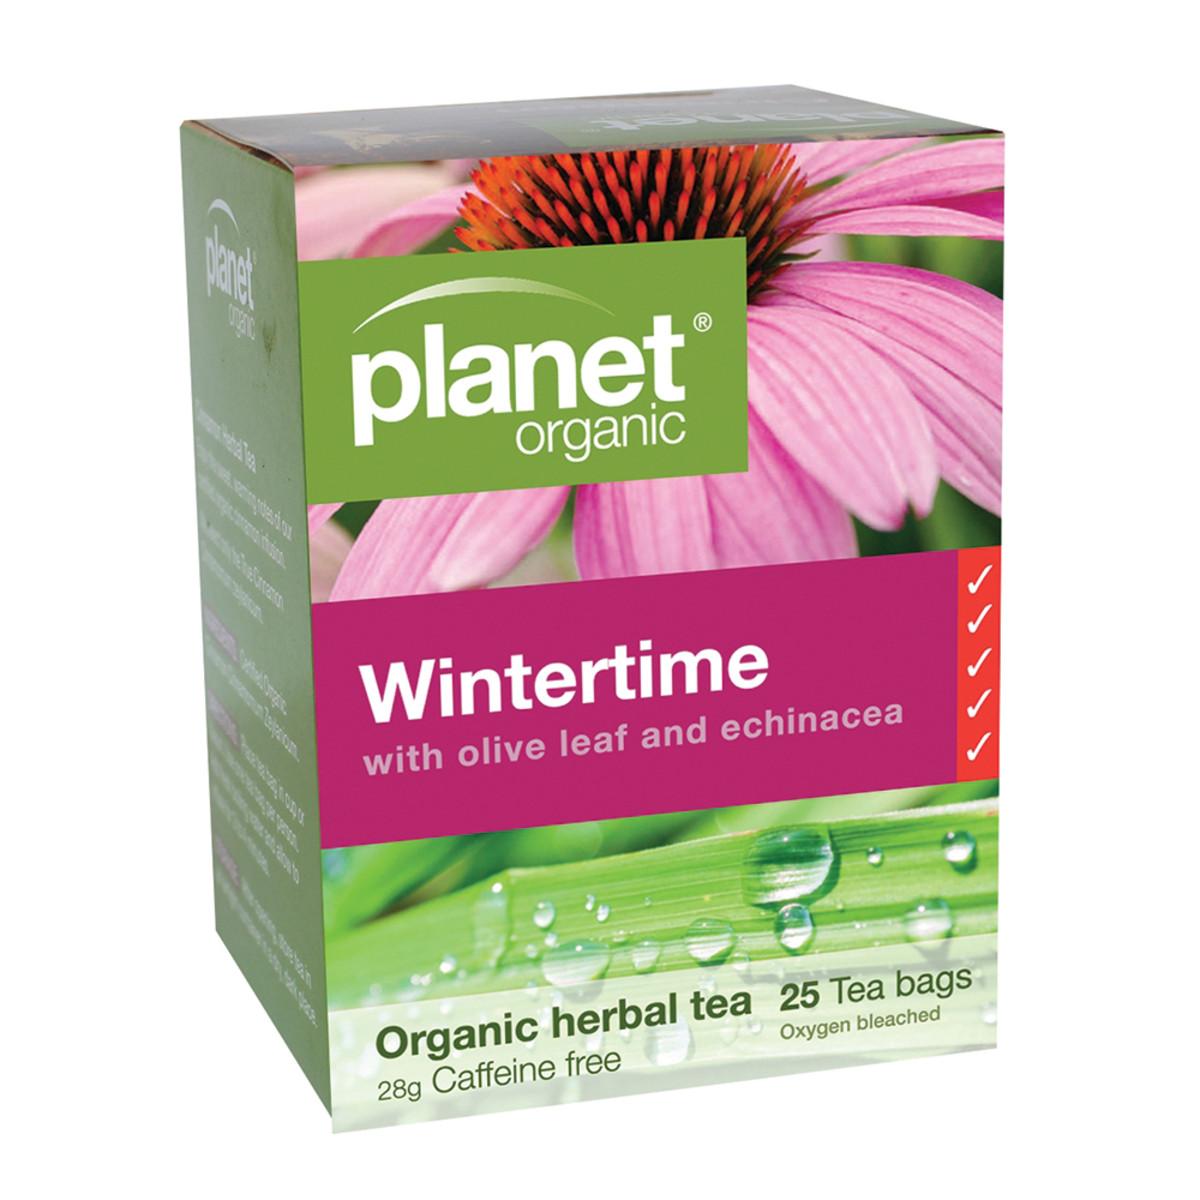 PLANET ORGANIC WINTERTIME TEA ORG 25TB